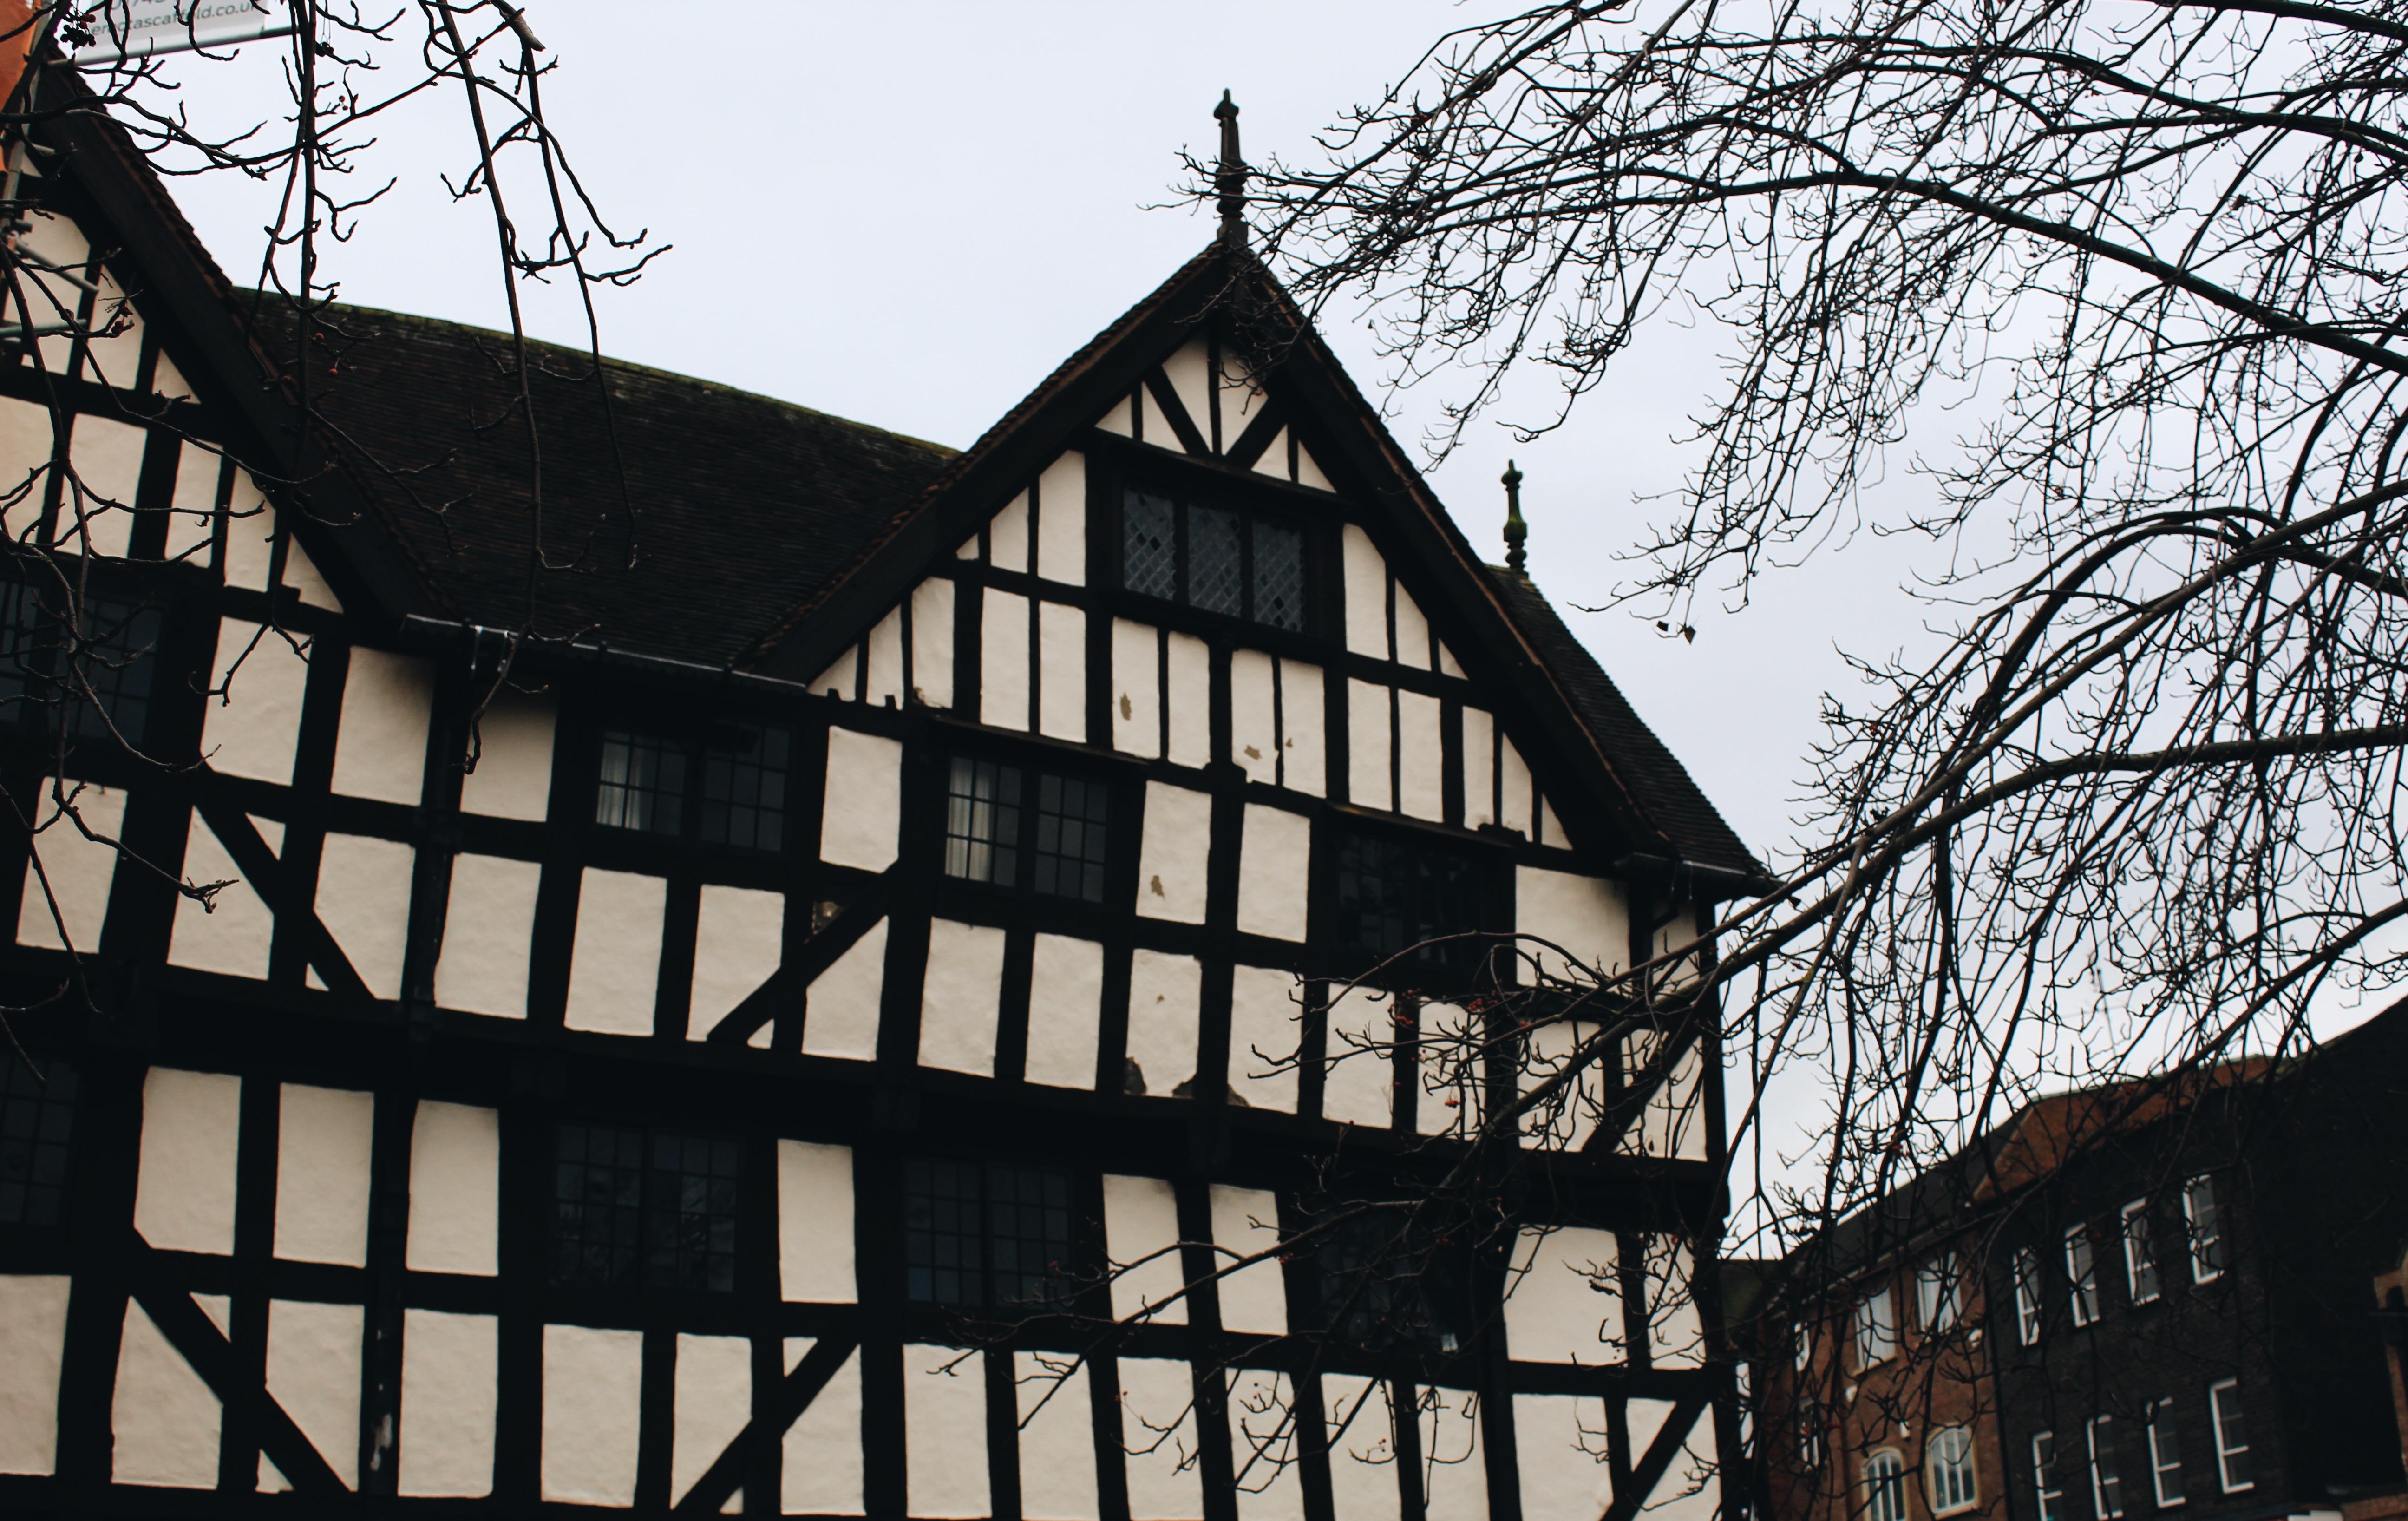 Shrewsbury Traditional Buildings